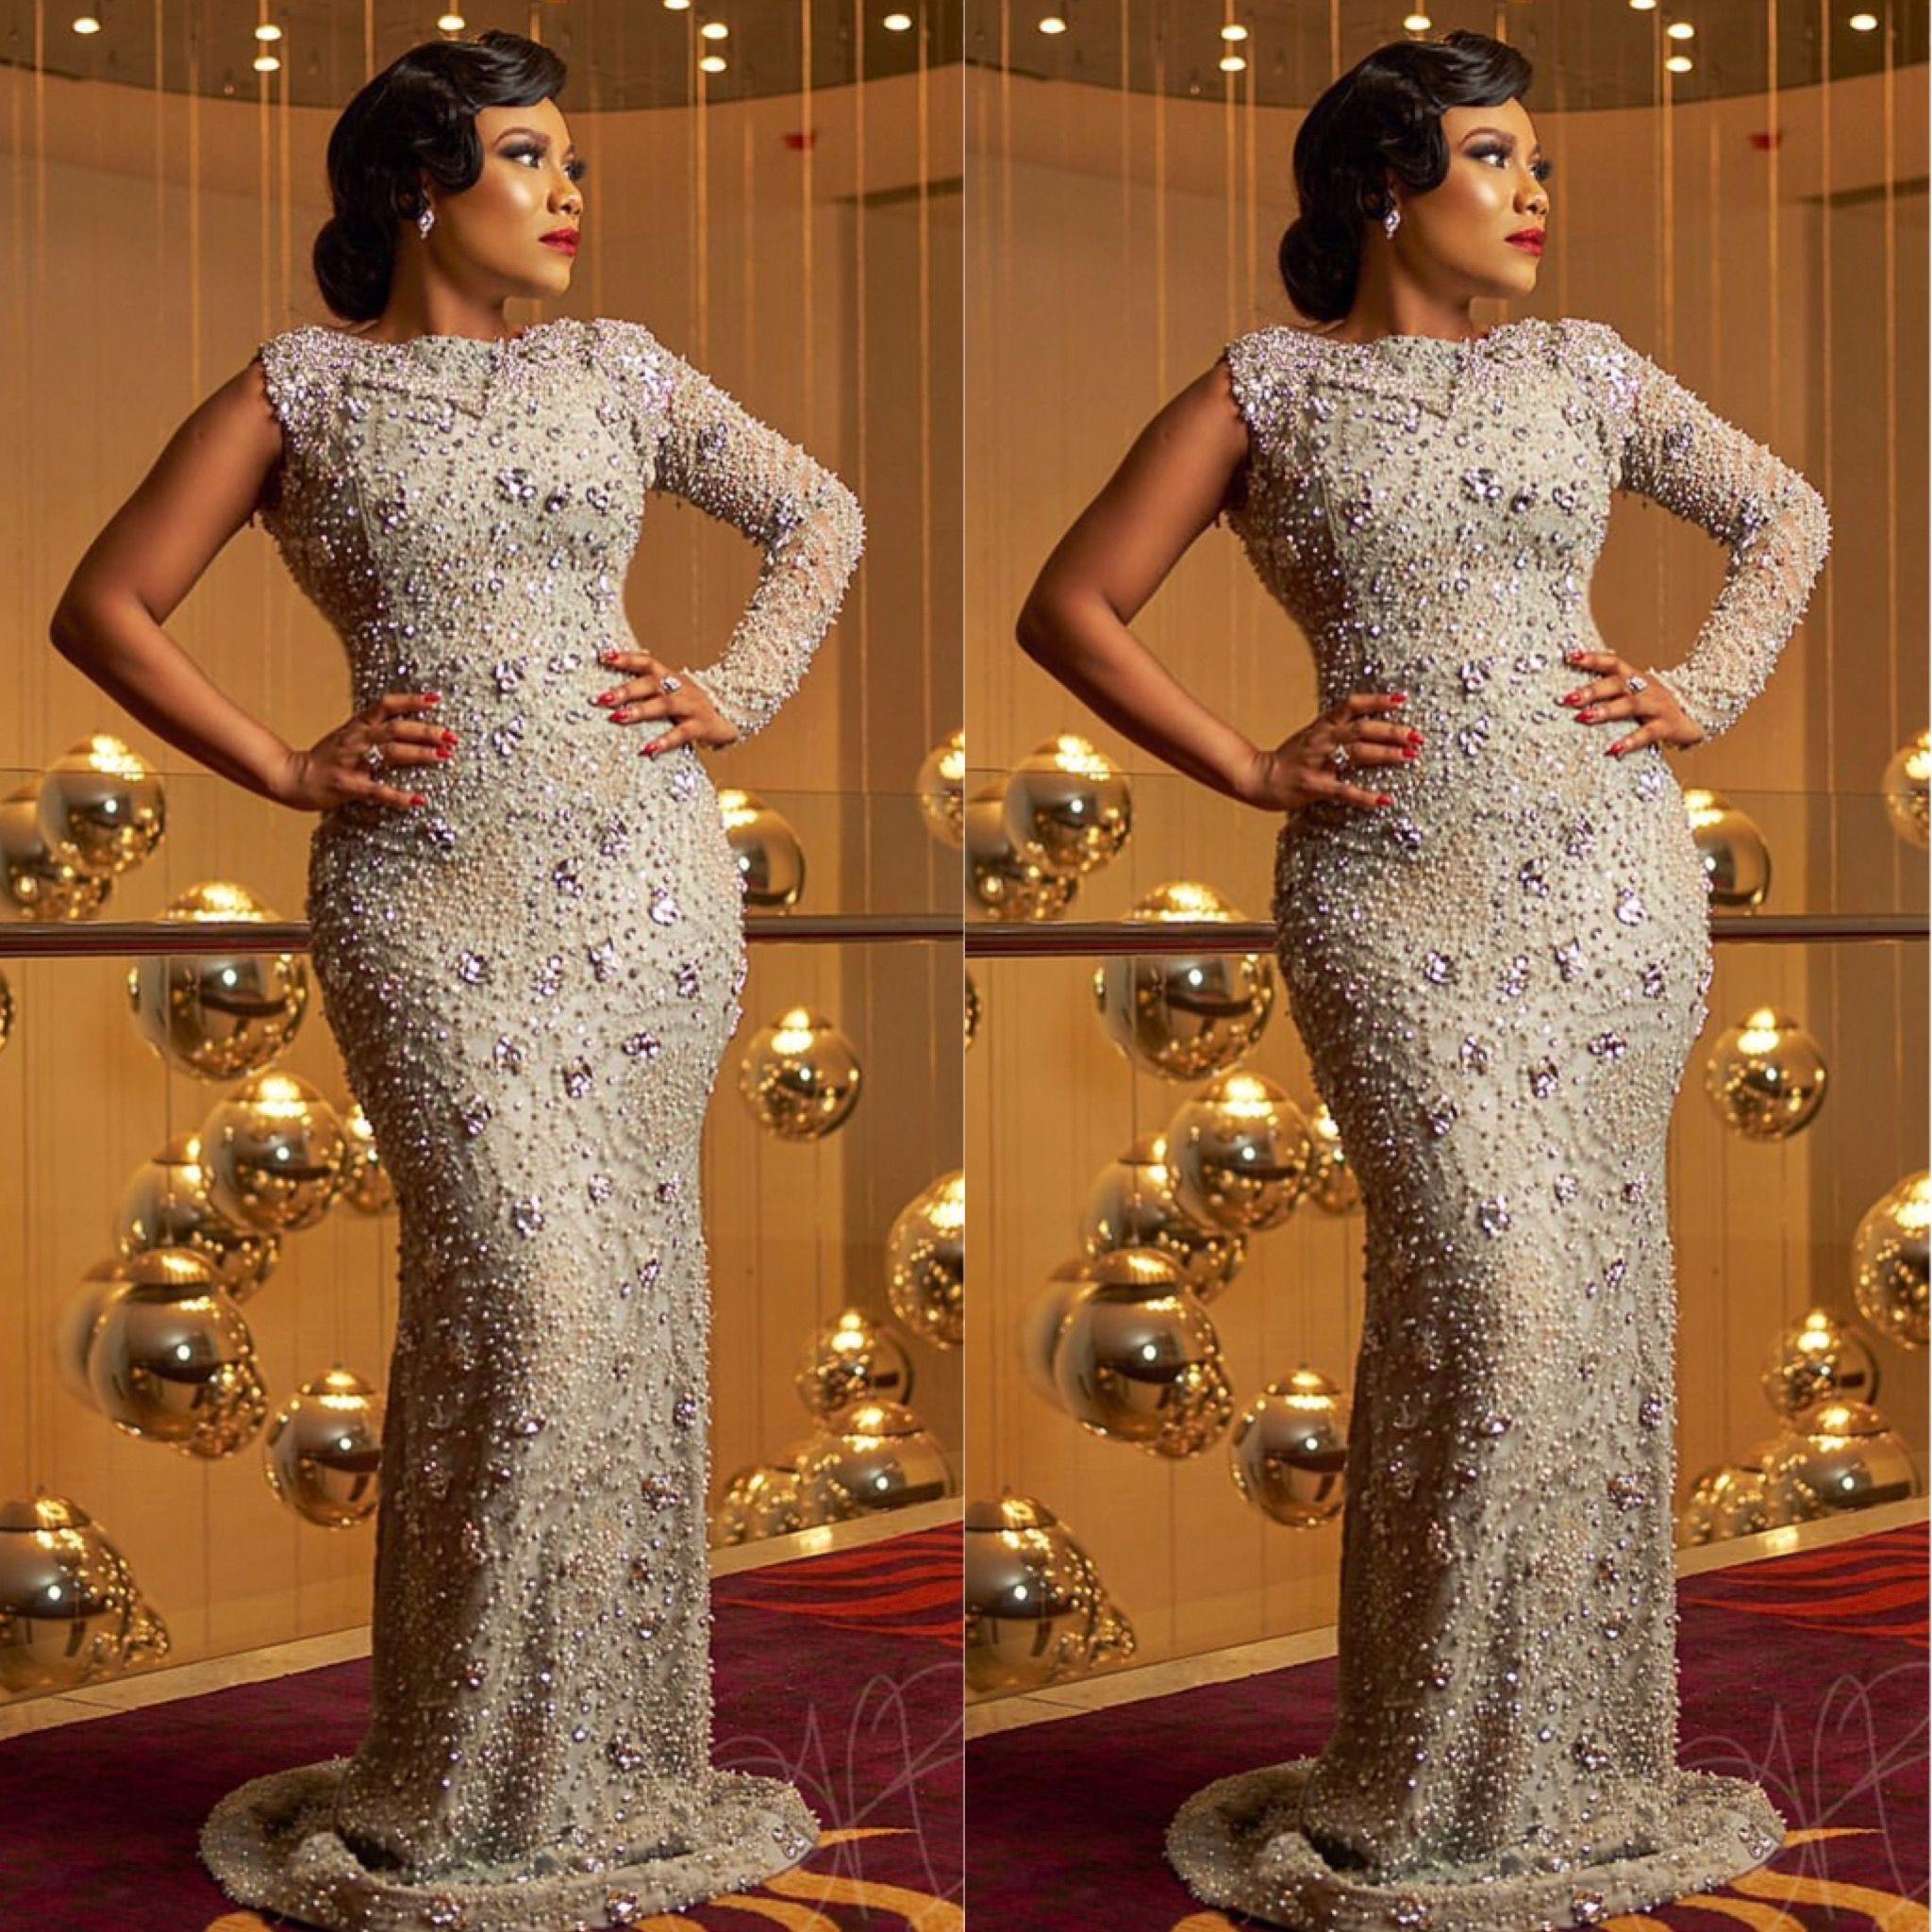 Ghana lace dress styles  Pin by Choucha on Wedding dress  Pinterest  African fashion